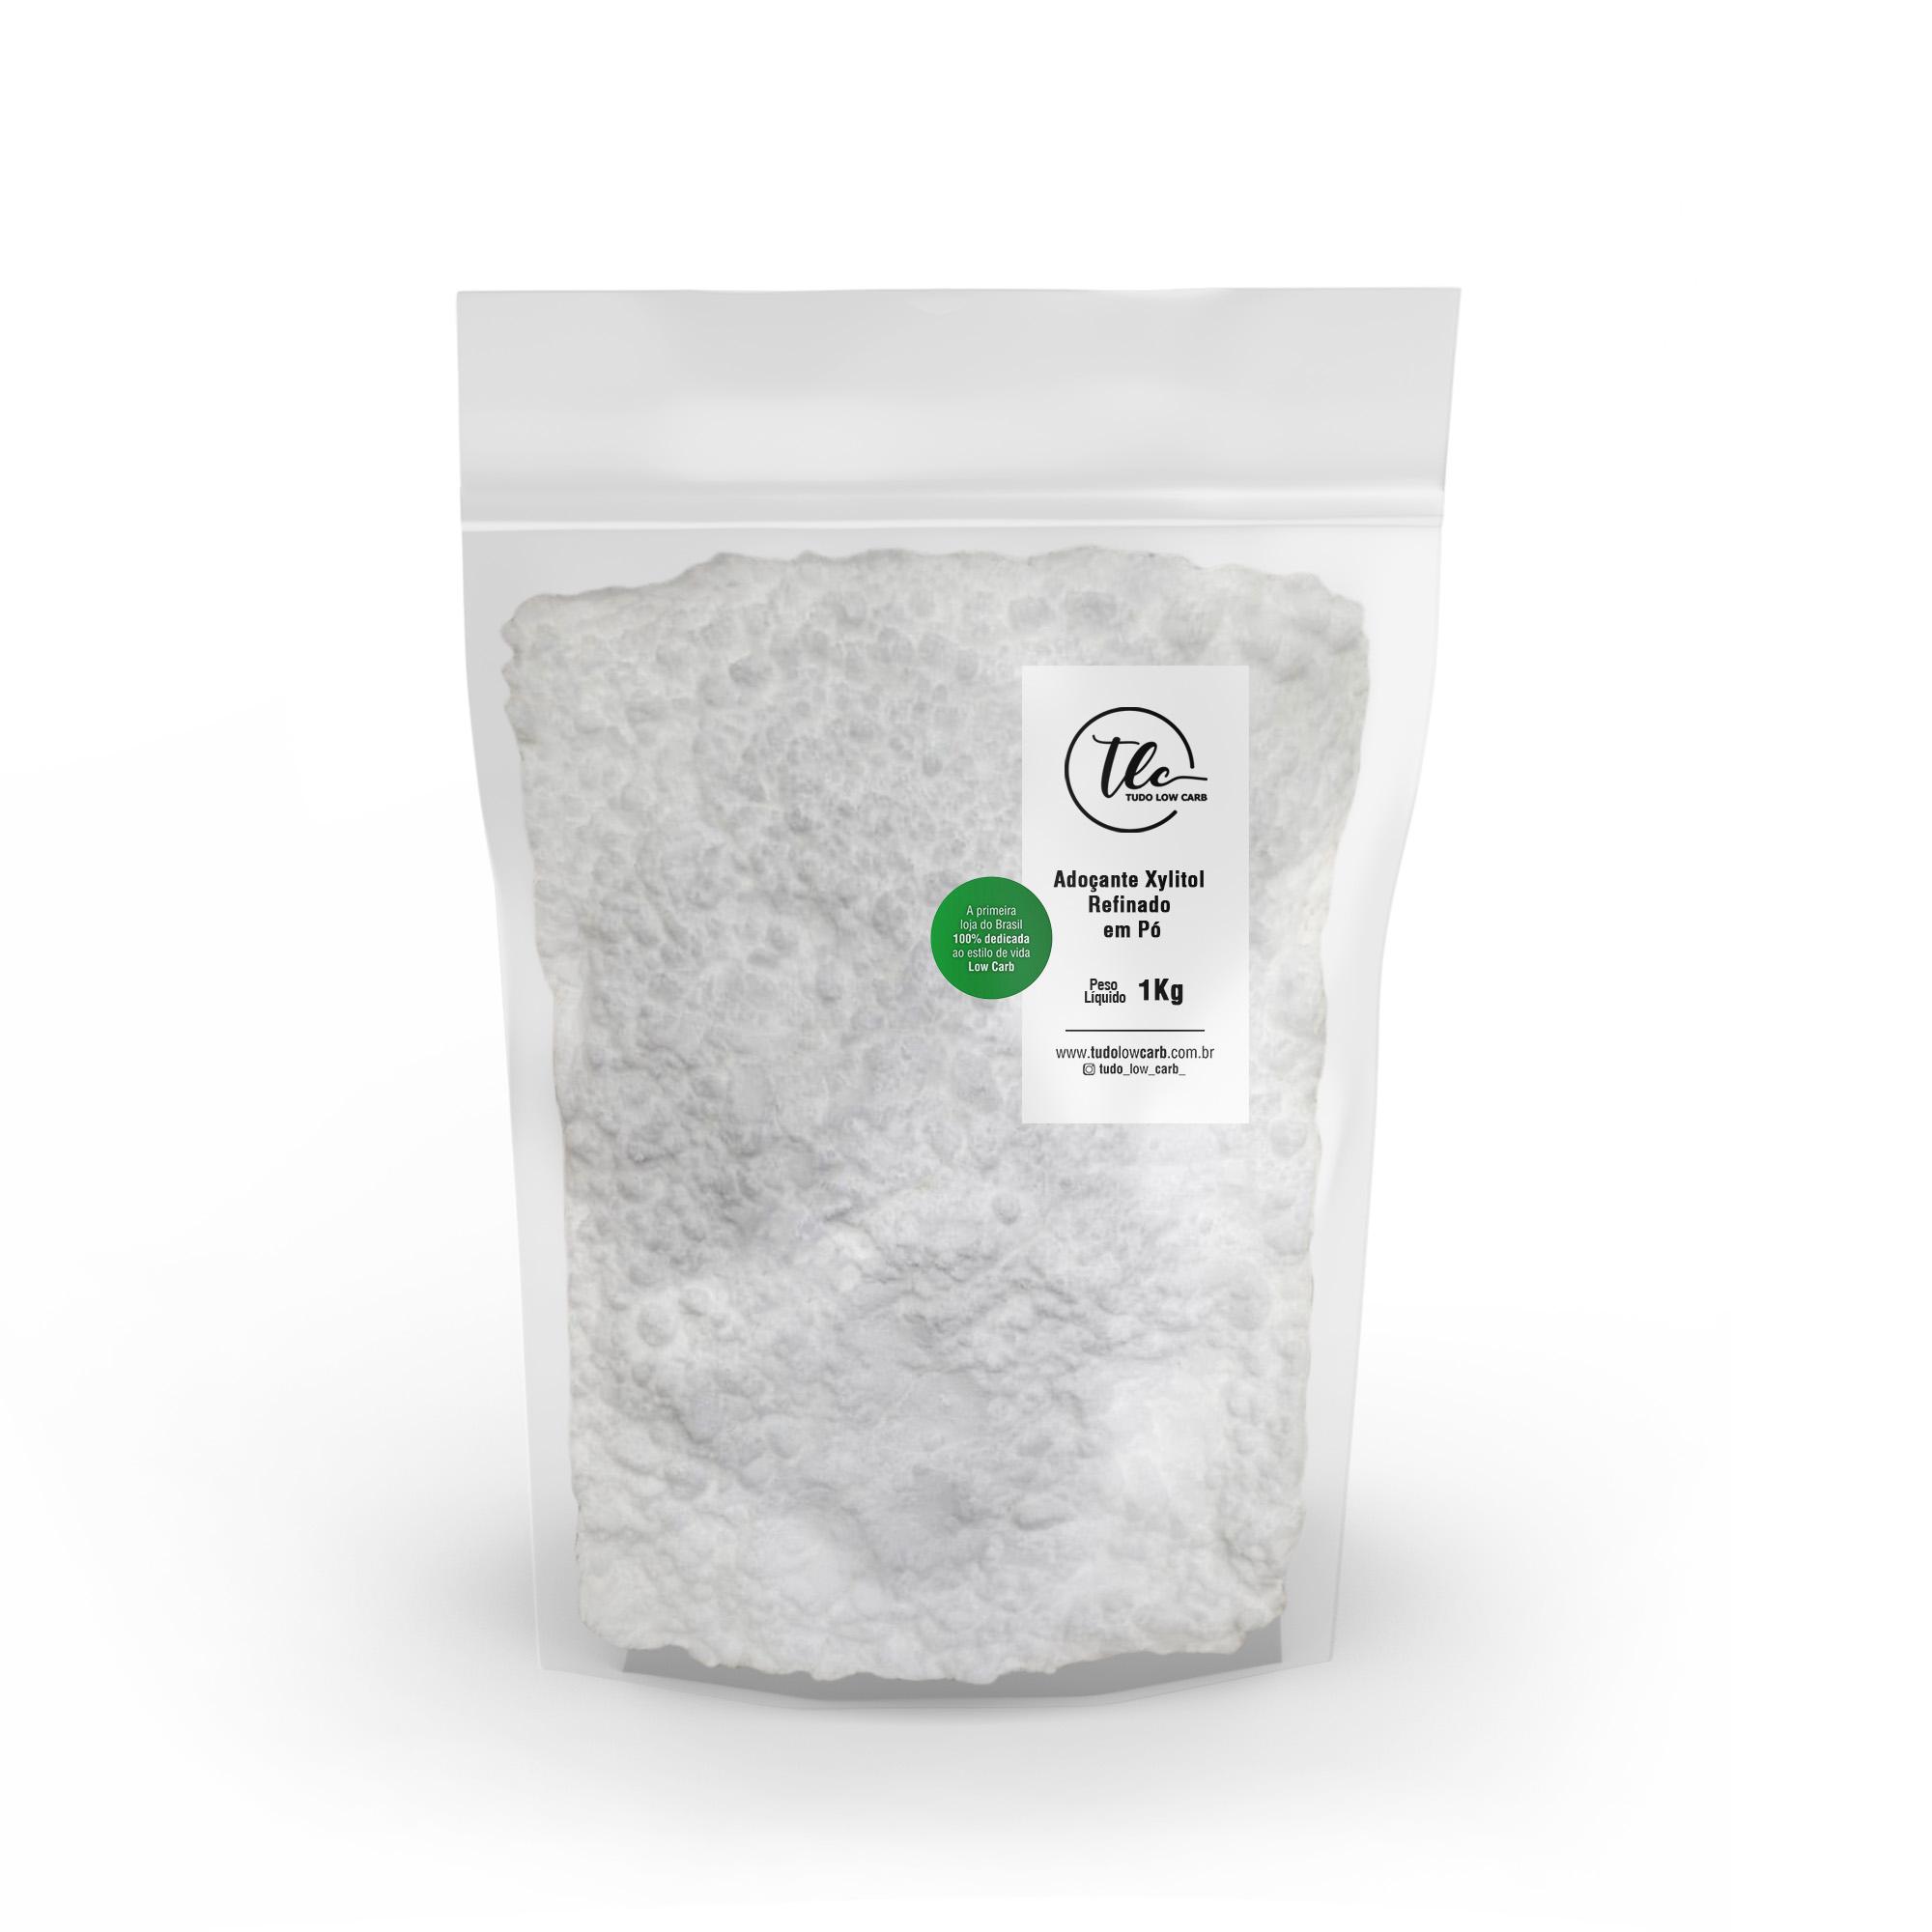 Adoçante Xylitol (Xilitol) Refinado Pó 1 kg  - TLC Tudo Low Carb